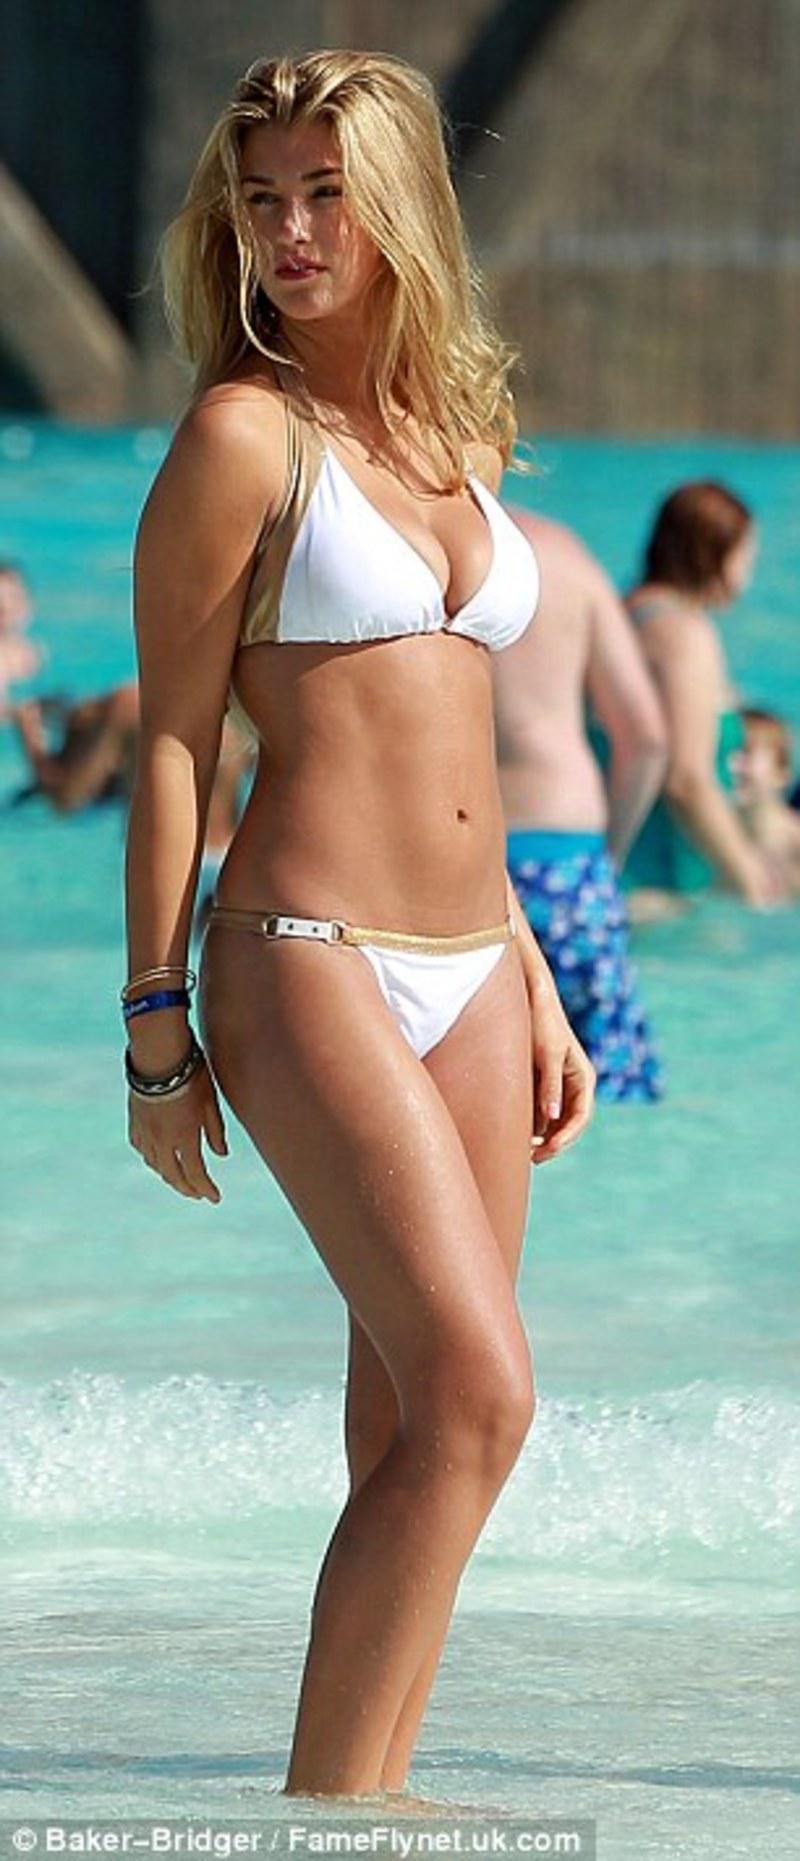 Amateur Teens im Bikini 036